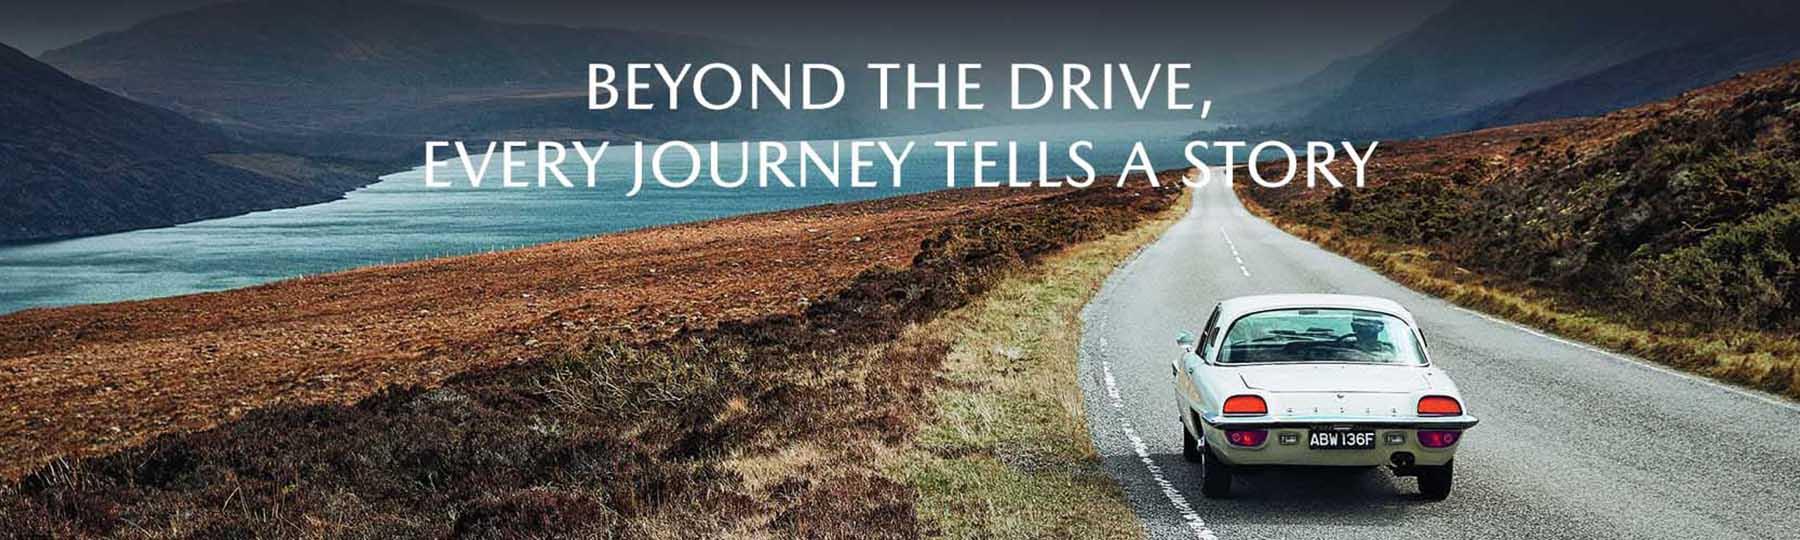 Mazda Beyond the Drive